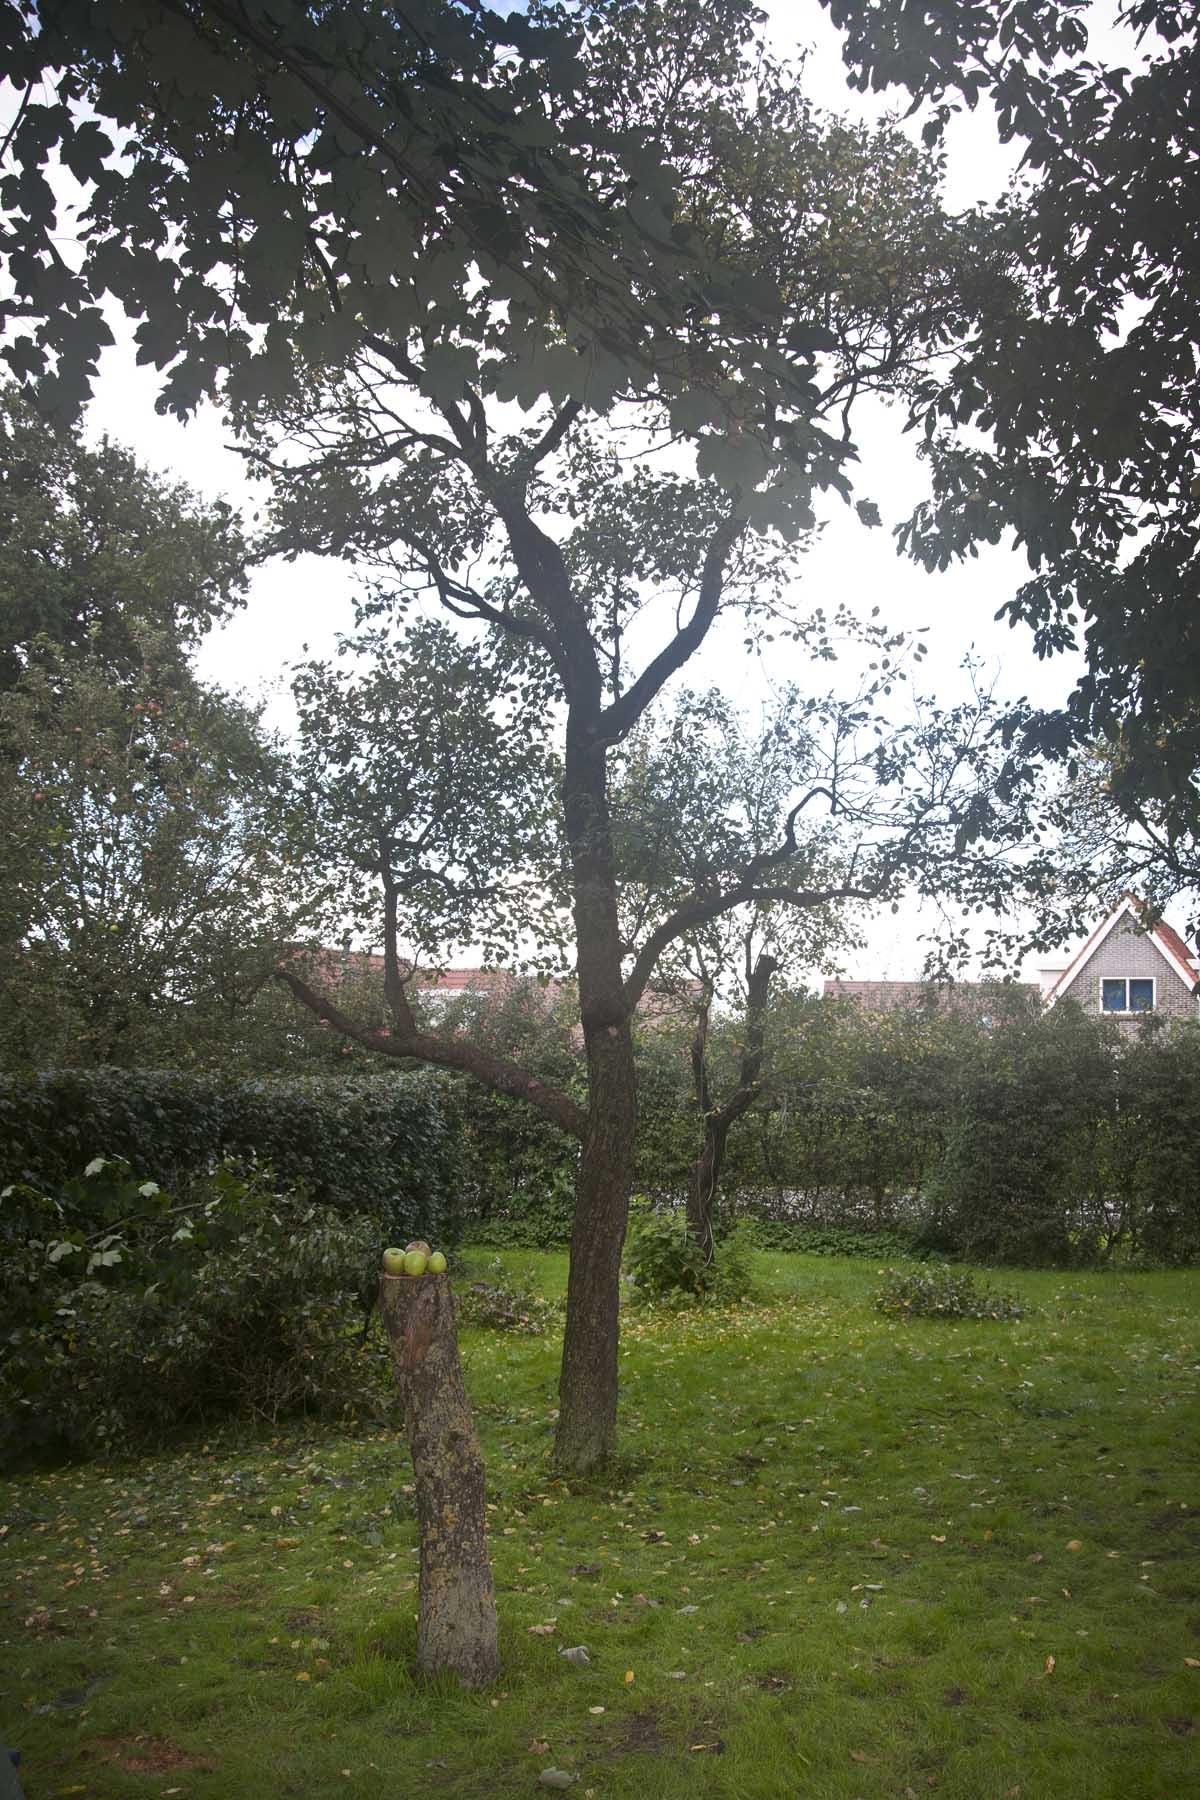 2015 09 19 HSB Steenwijk 5978